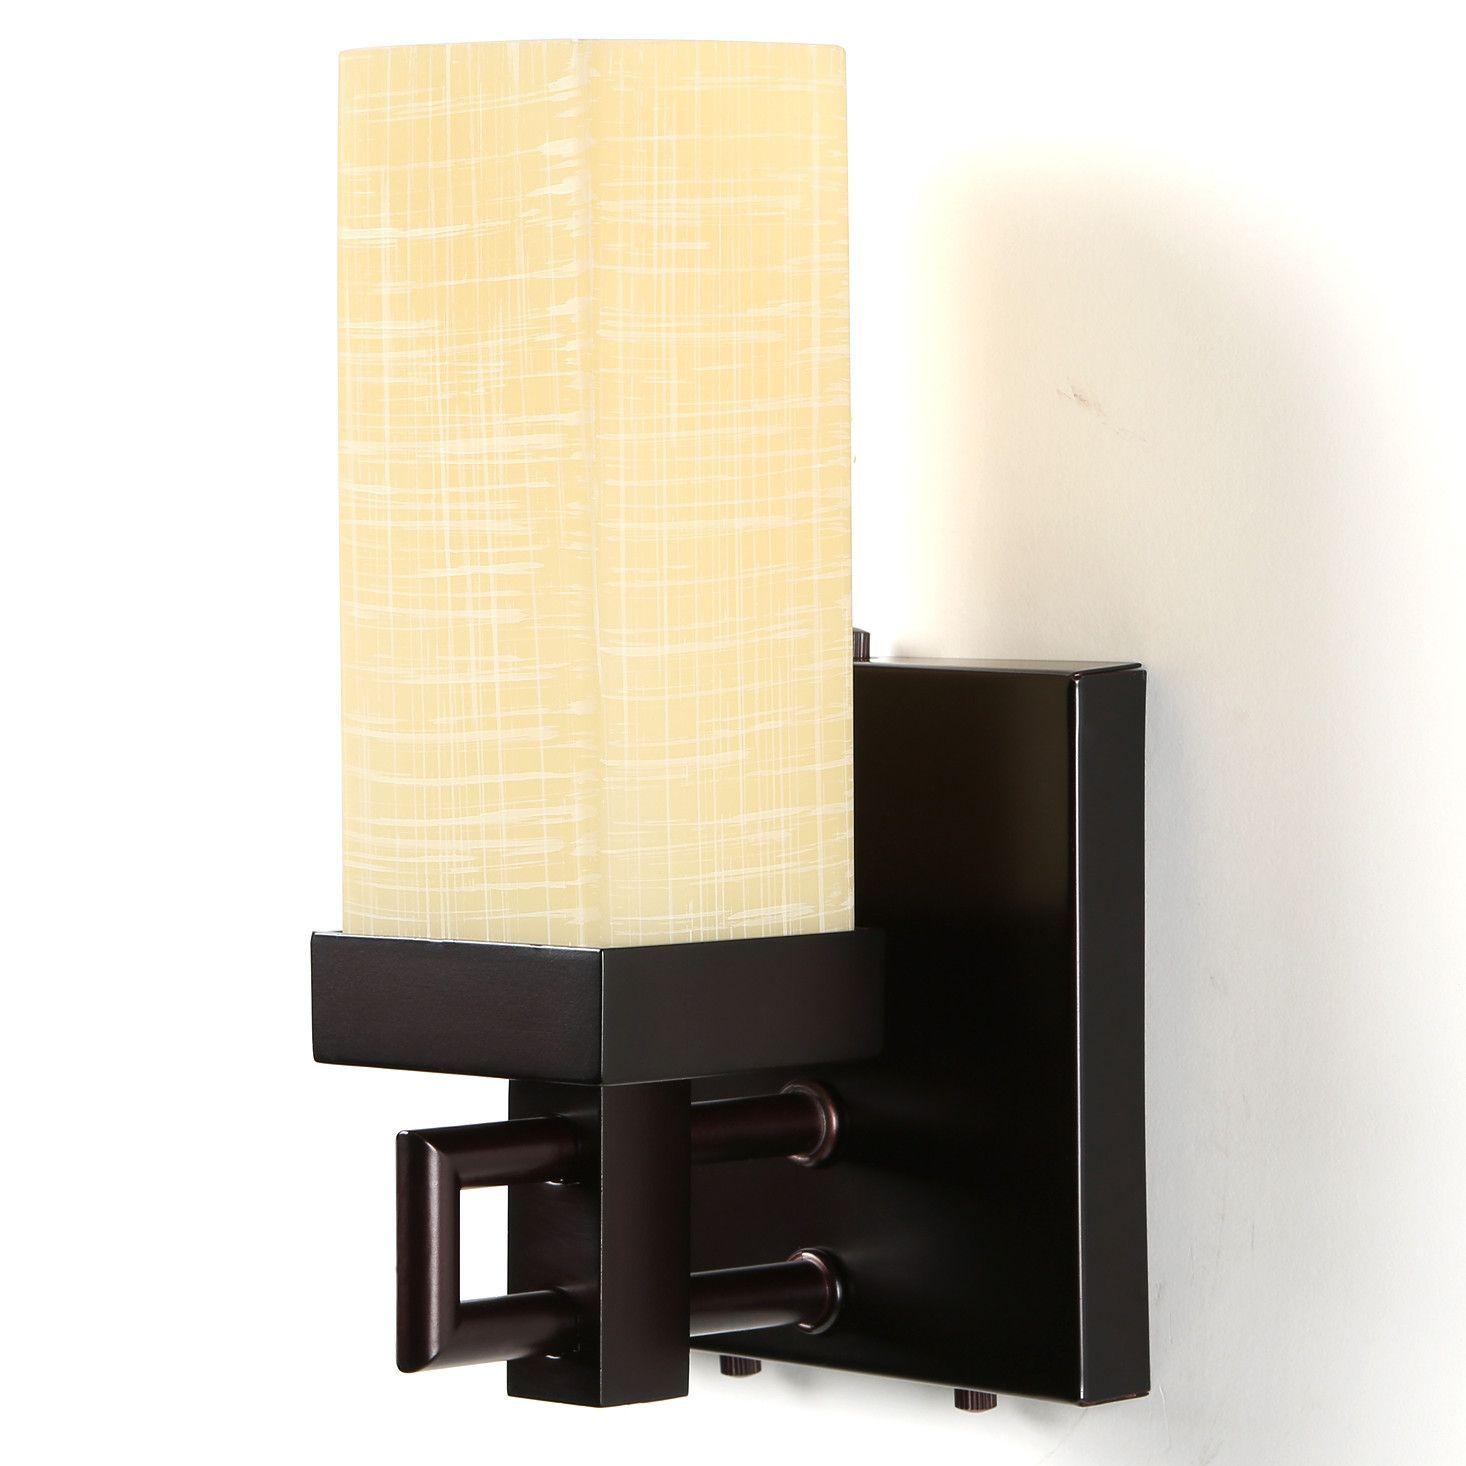 Casa 1 Light Wall Sconce